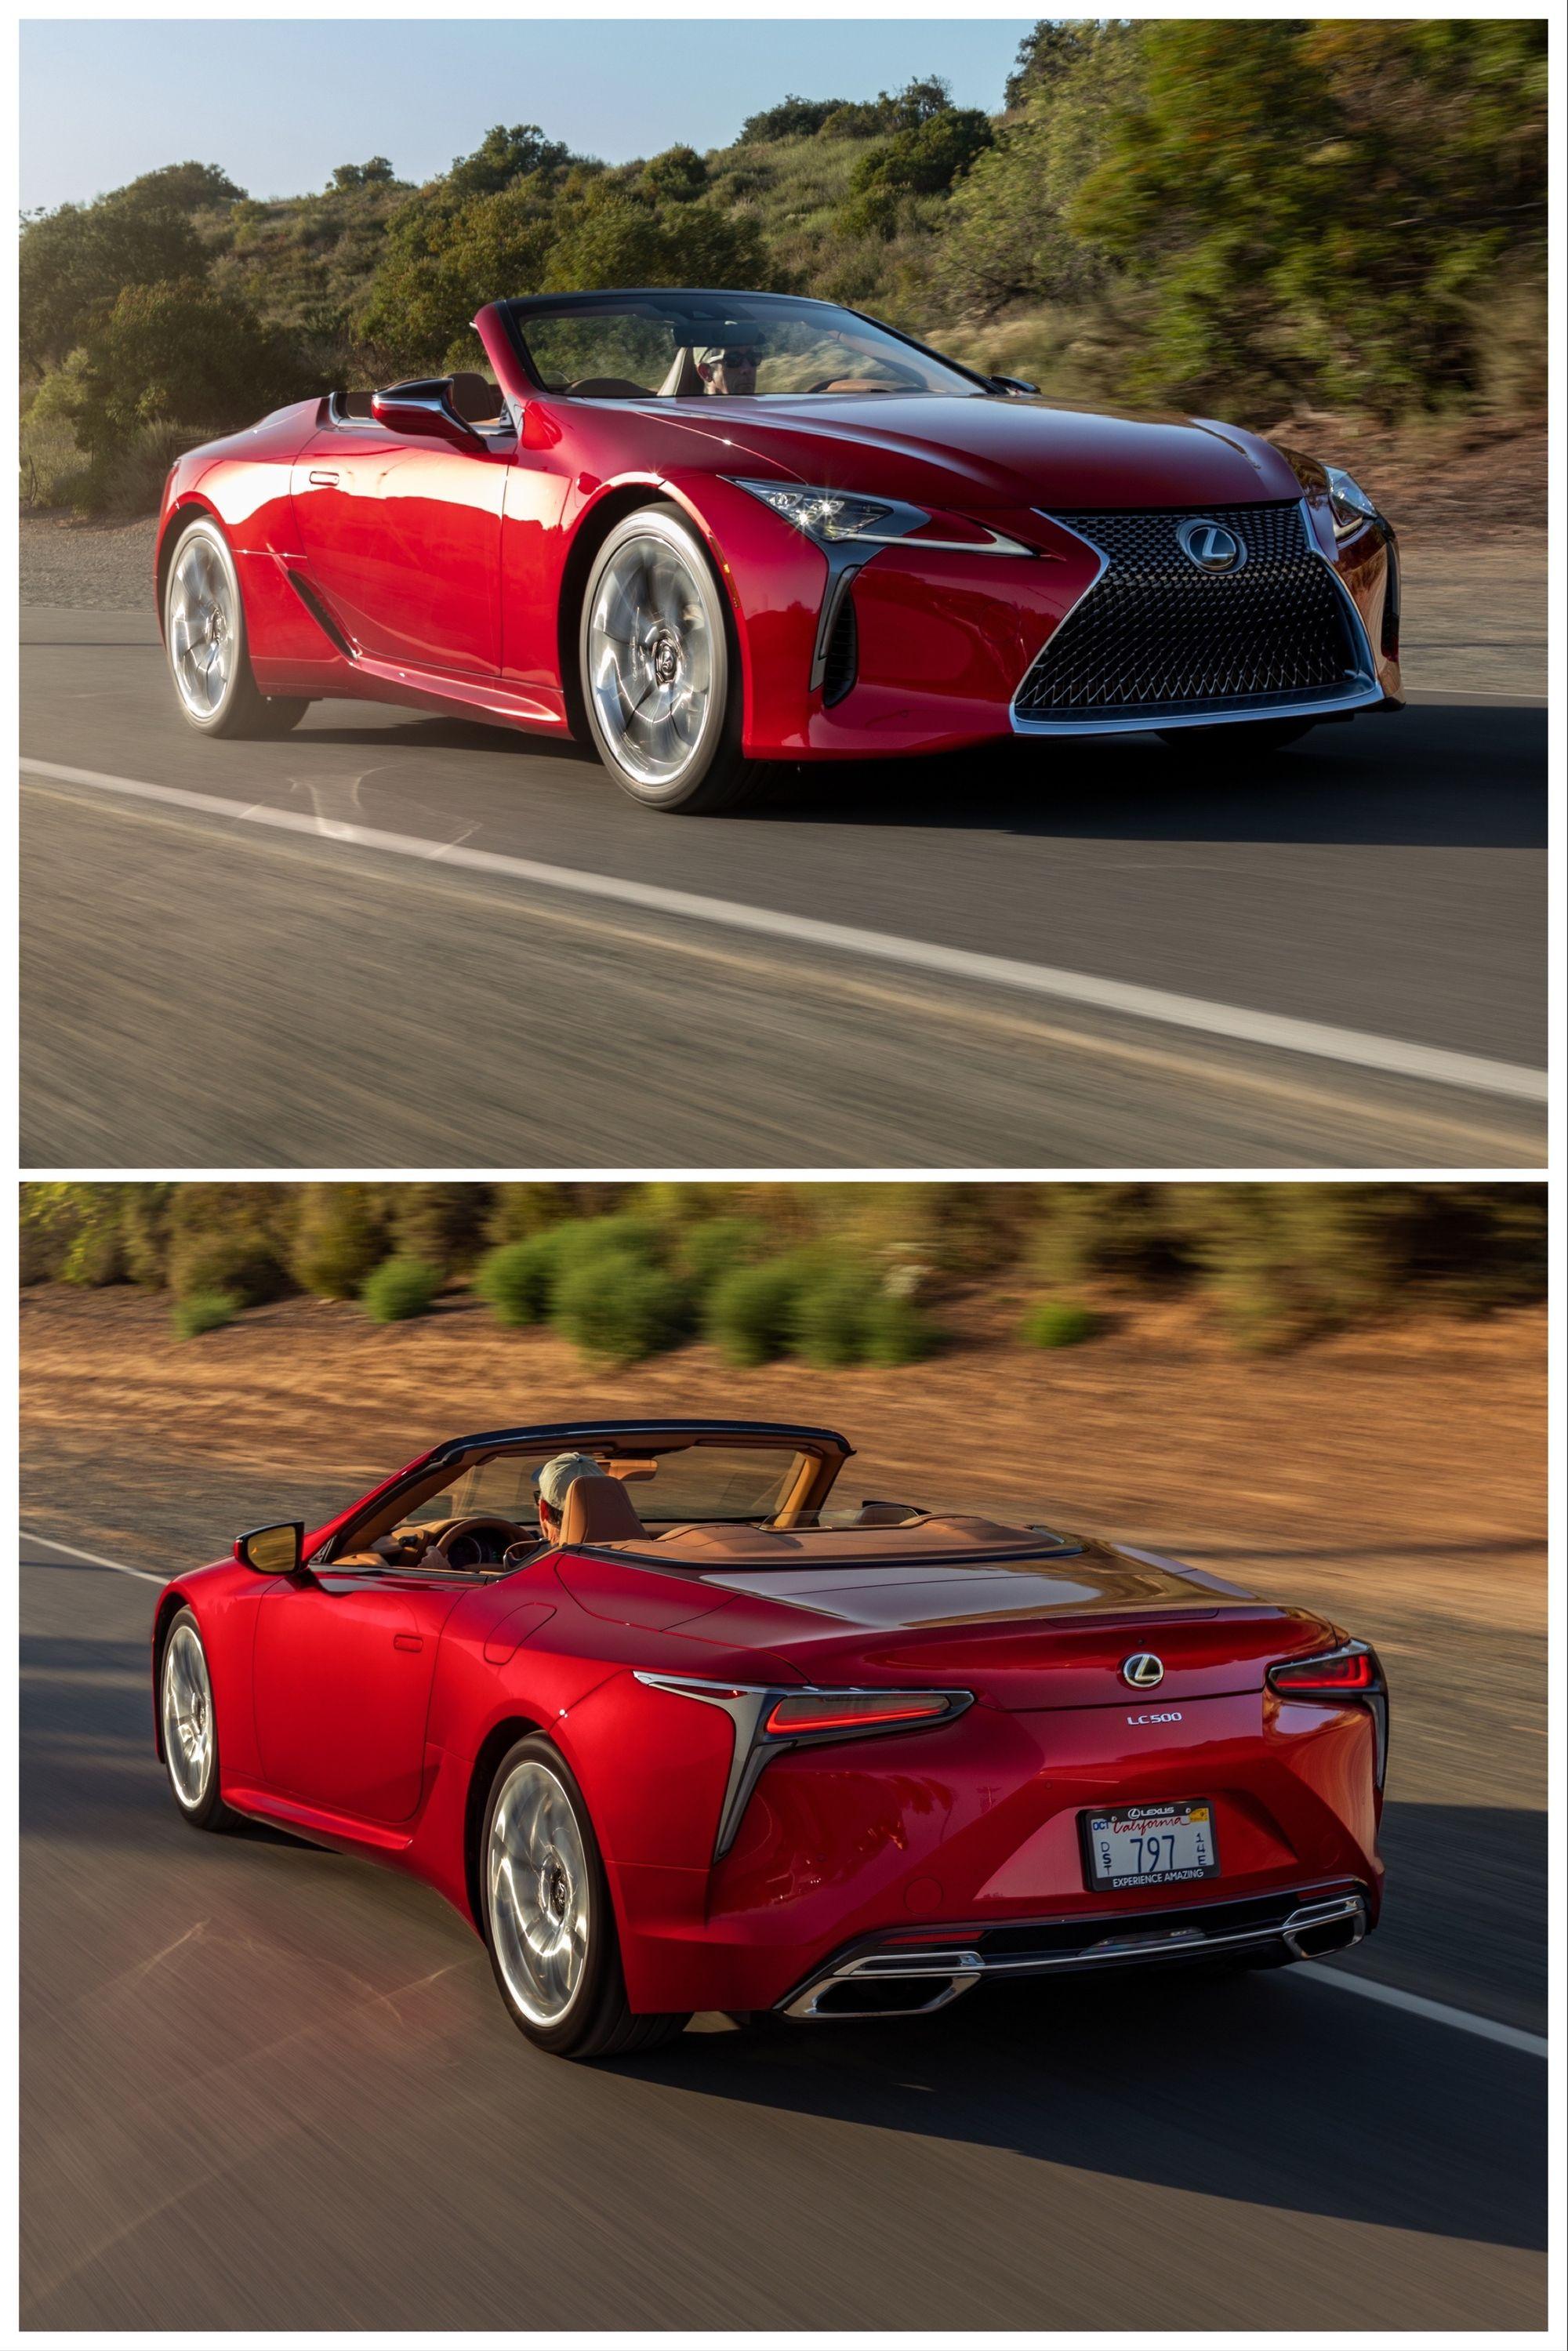 2021 Lexus Lc500 Convertible First Test Drive In 2020 Lexus Lc Lexus Convertible